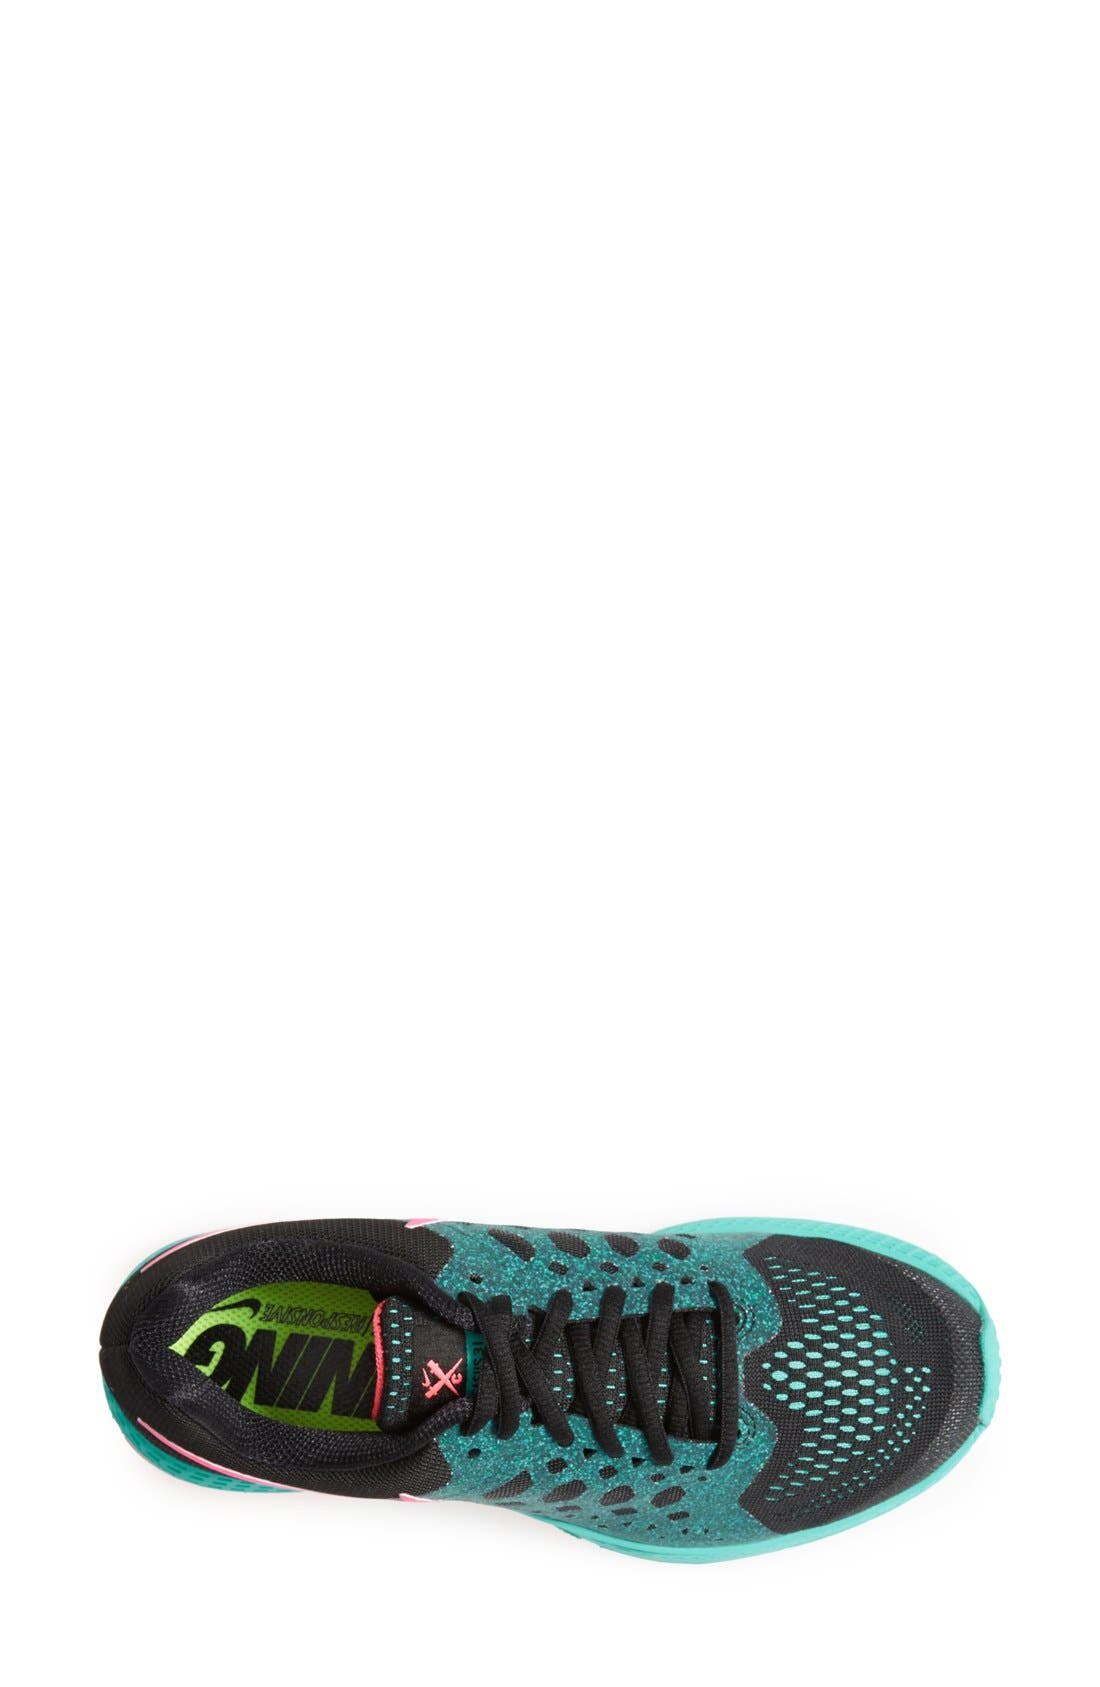 NIKE, 'Air Pegasus 31' Running Shoe, Alternate thumbnail 2, color, 002